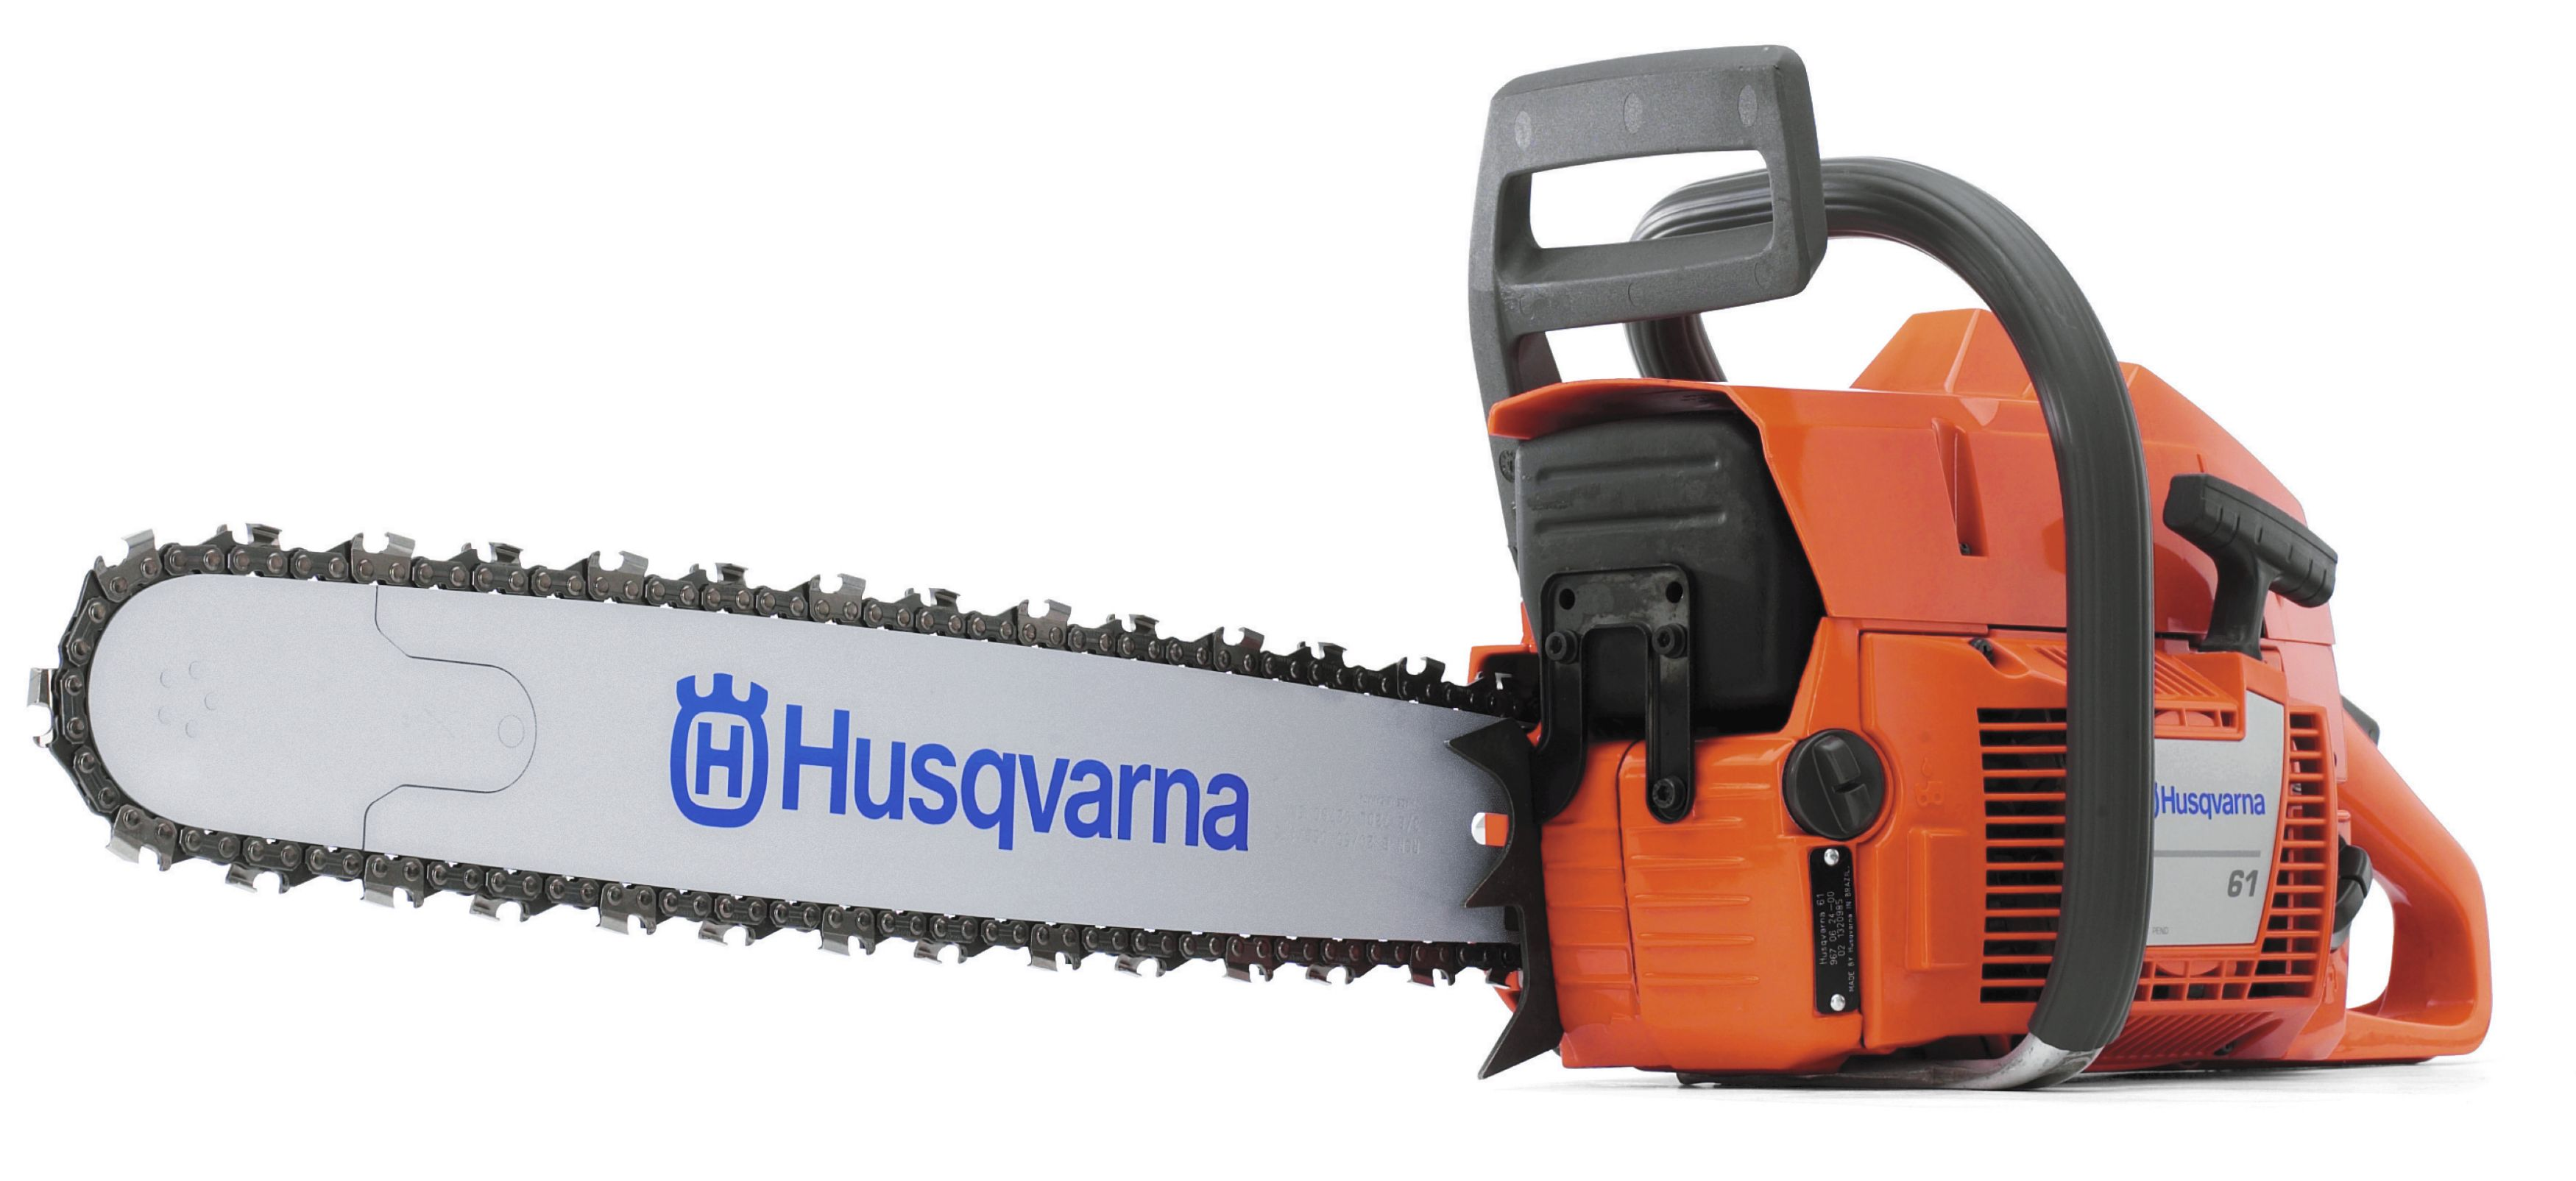 Husqvarna Chainsaw: Model 61/1993-09 Parts & Repair Help